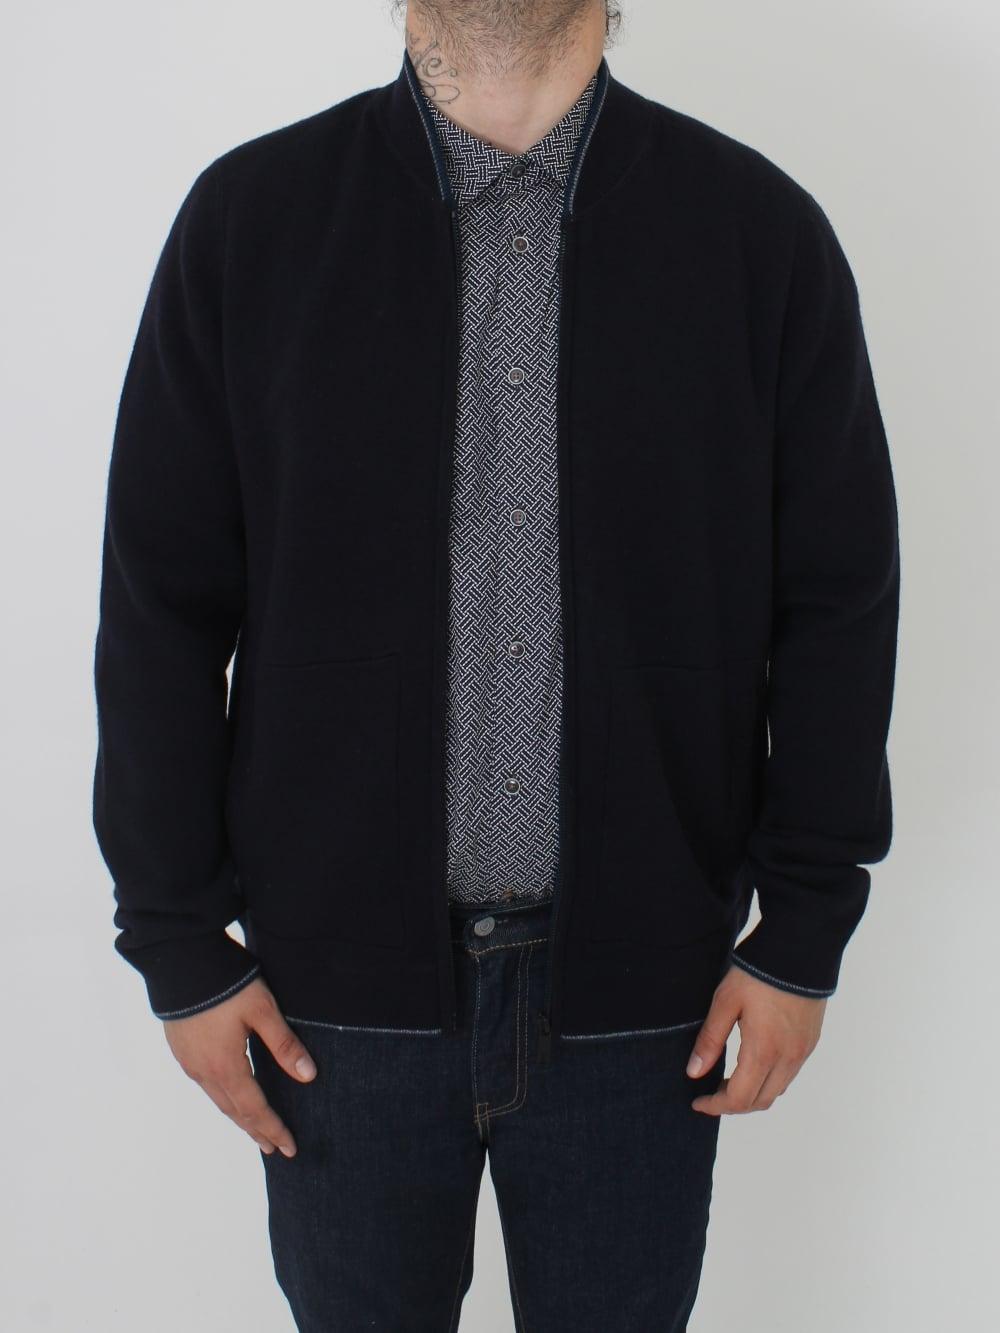 Ted Baker Capcino Zip Baseball Jacket in Navy - Northern Threads